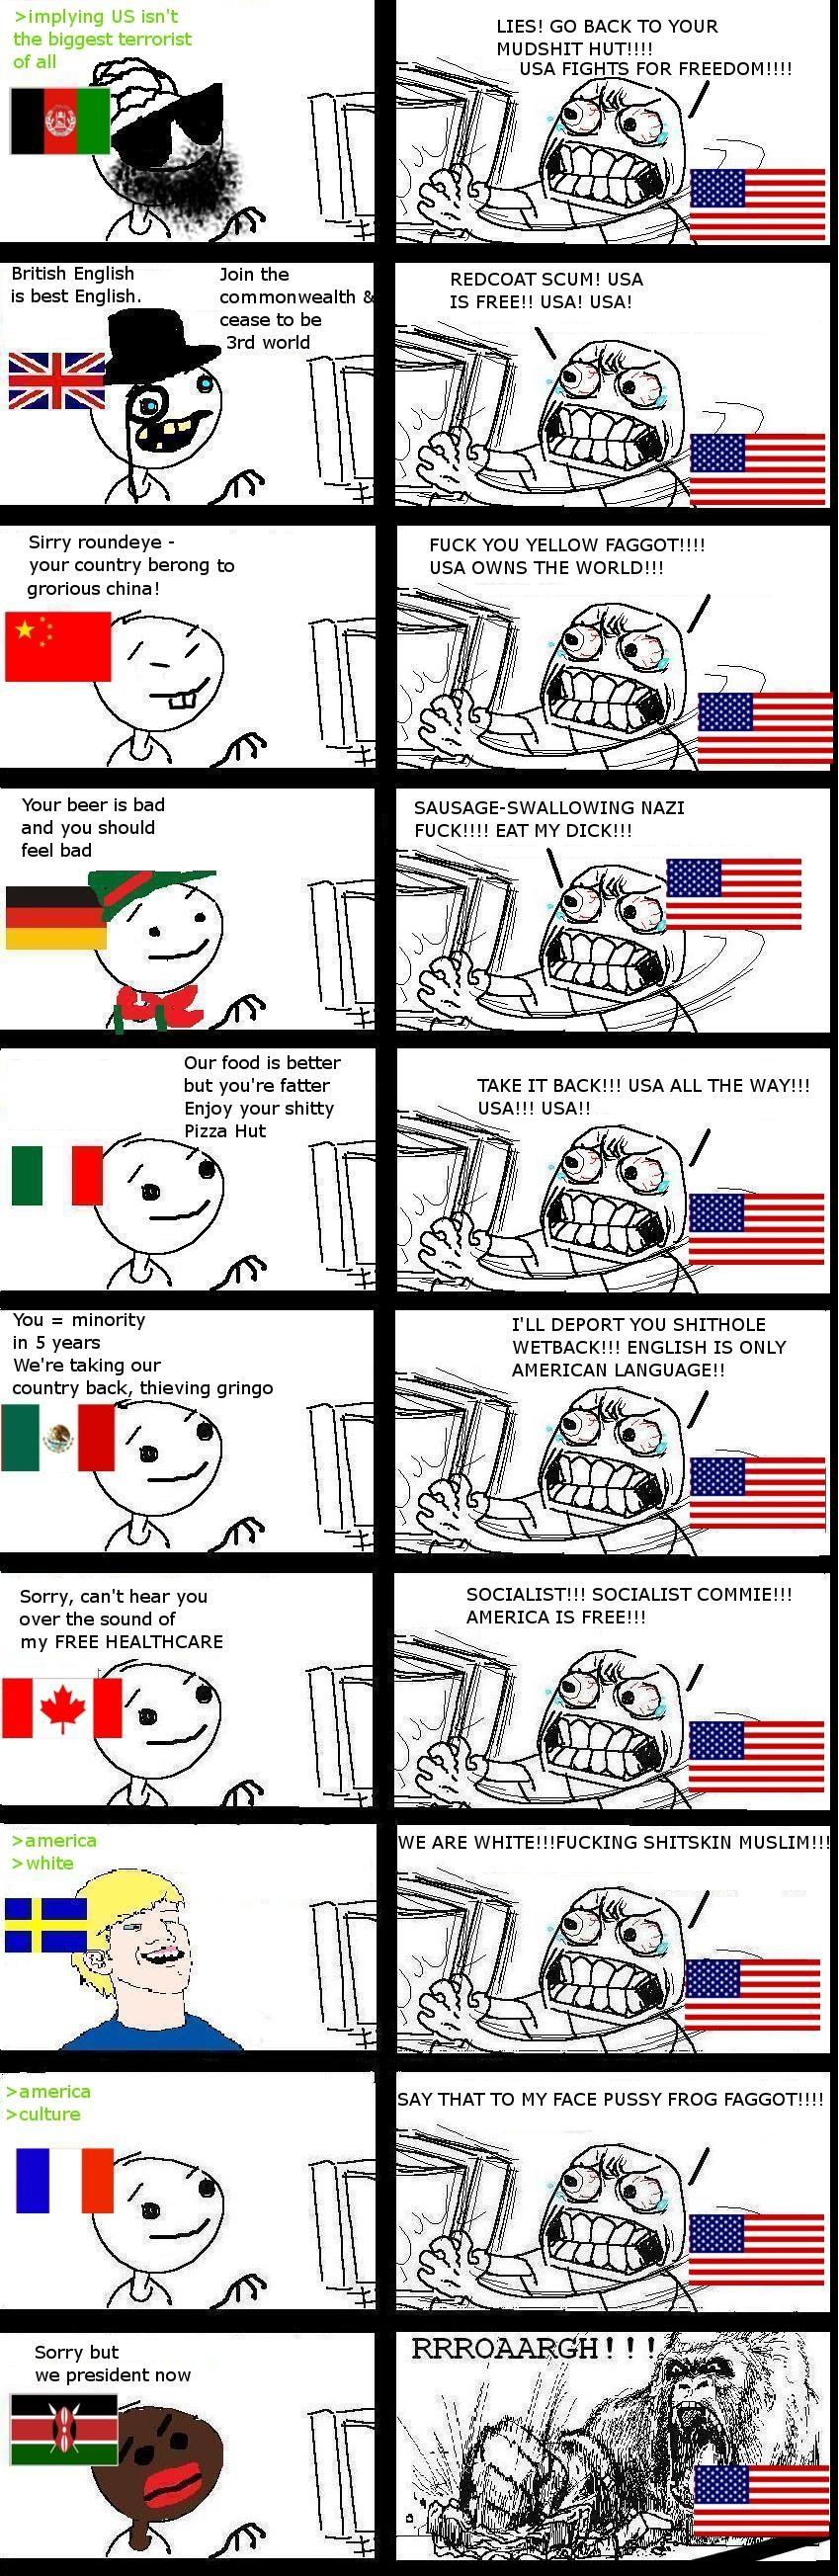 International 'murica rage